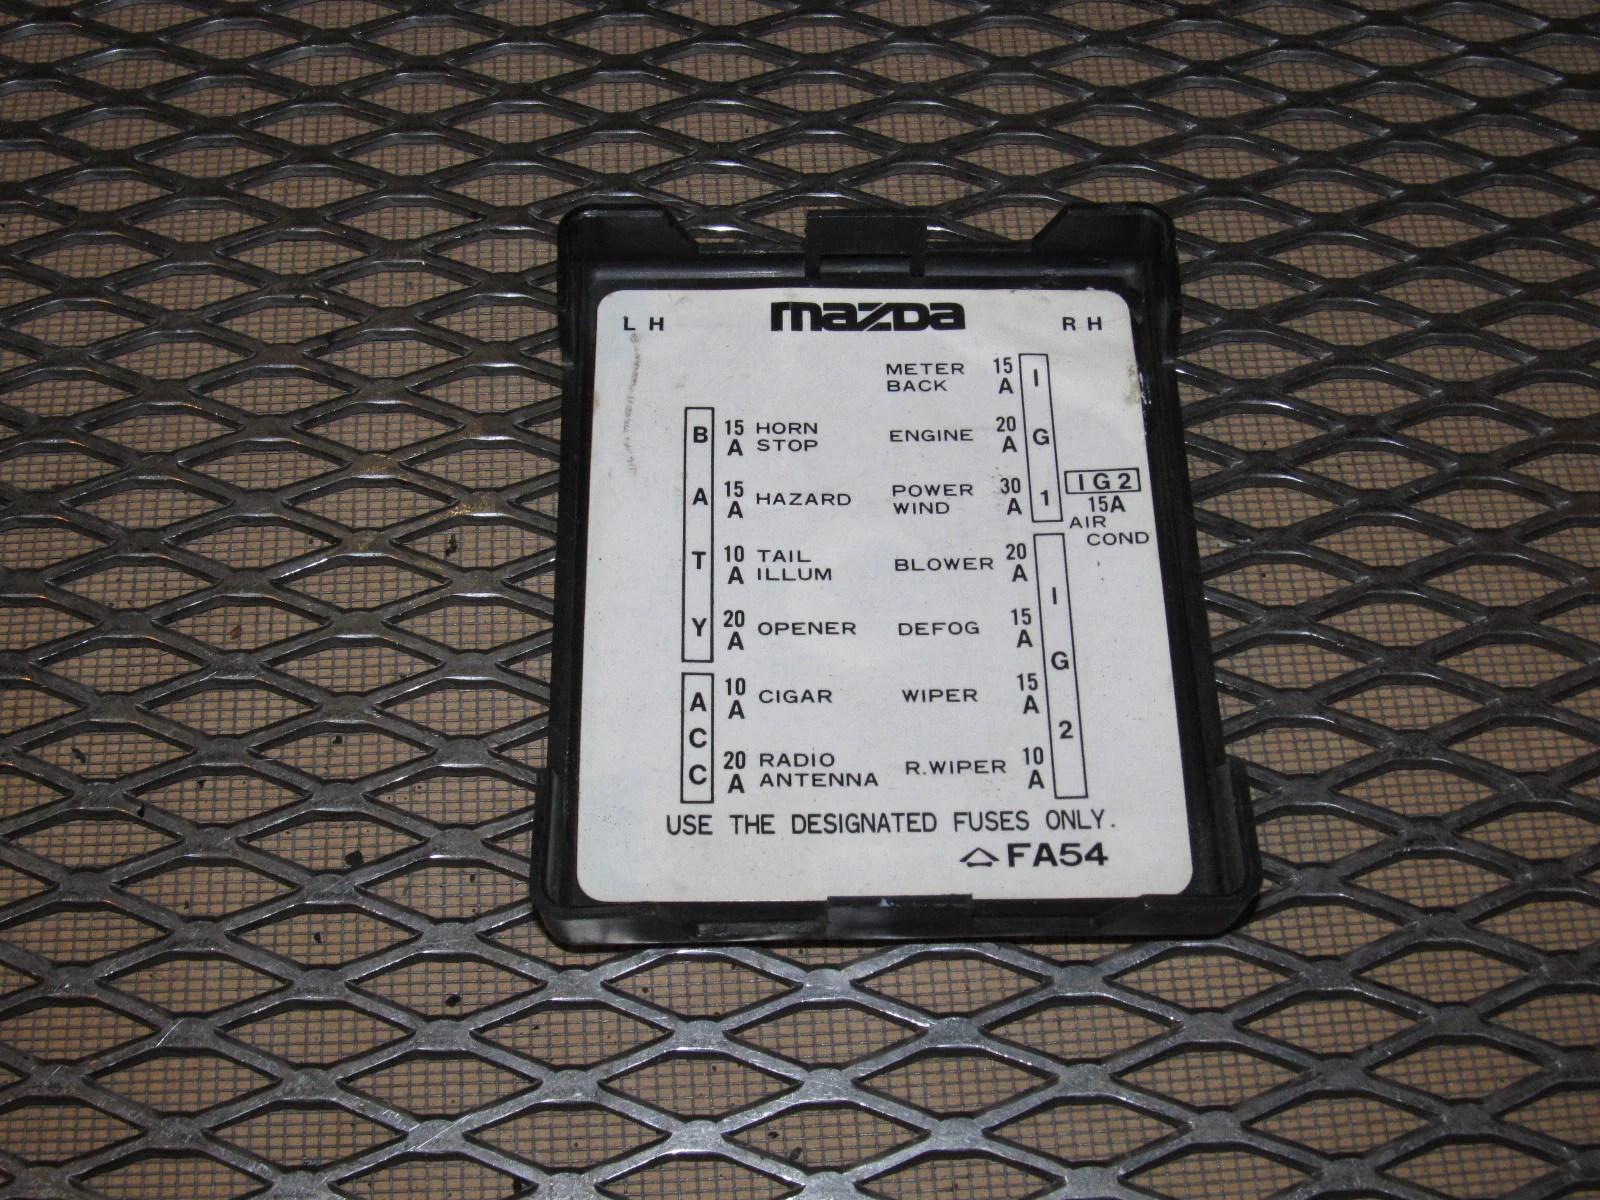 hight resolution of fc rx7 fuse box diagram detailed schematics diagram rh keyplusrubber com 1999 mazda 626 fuse box